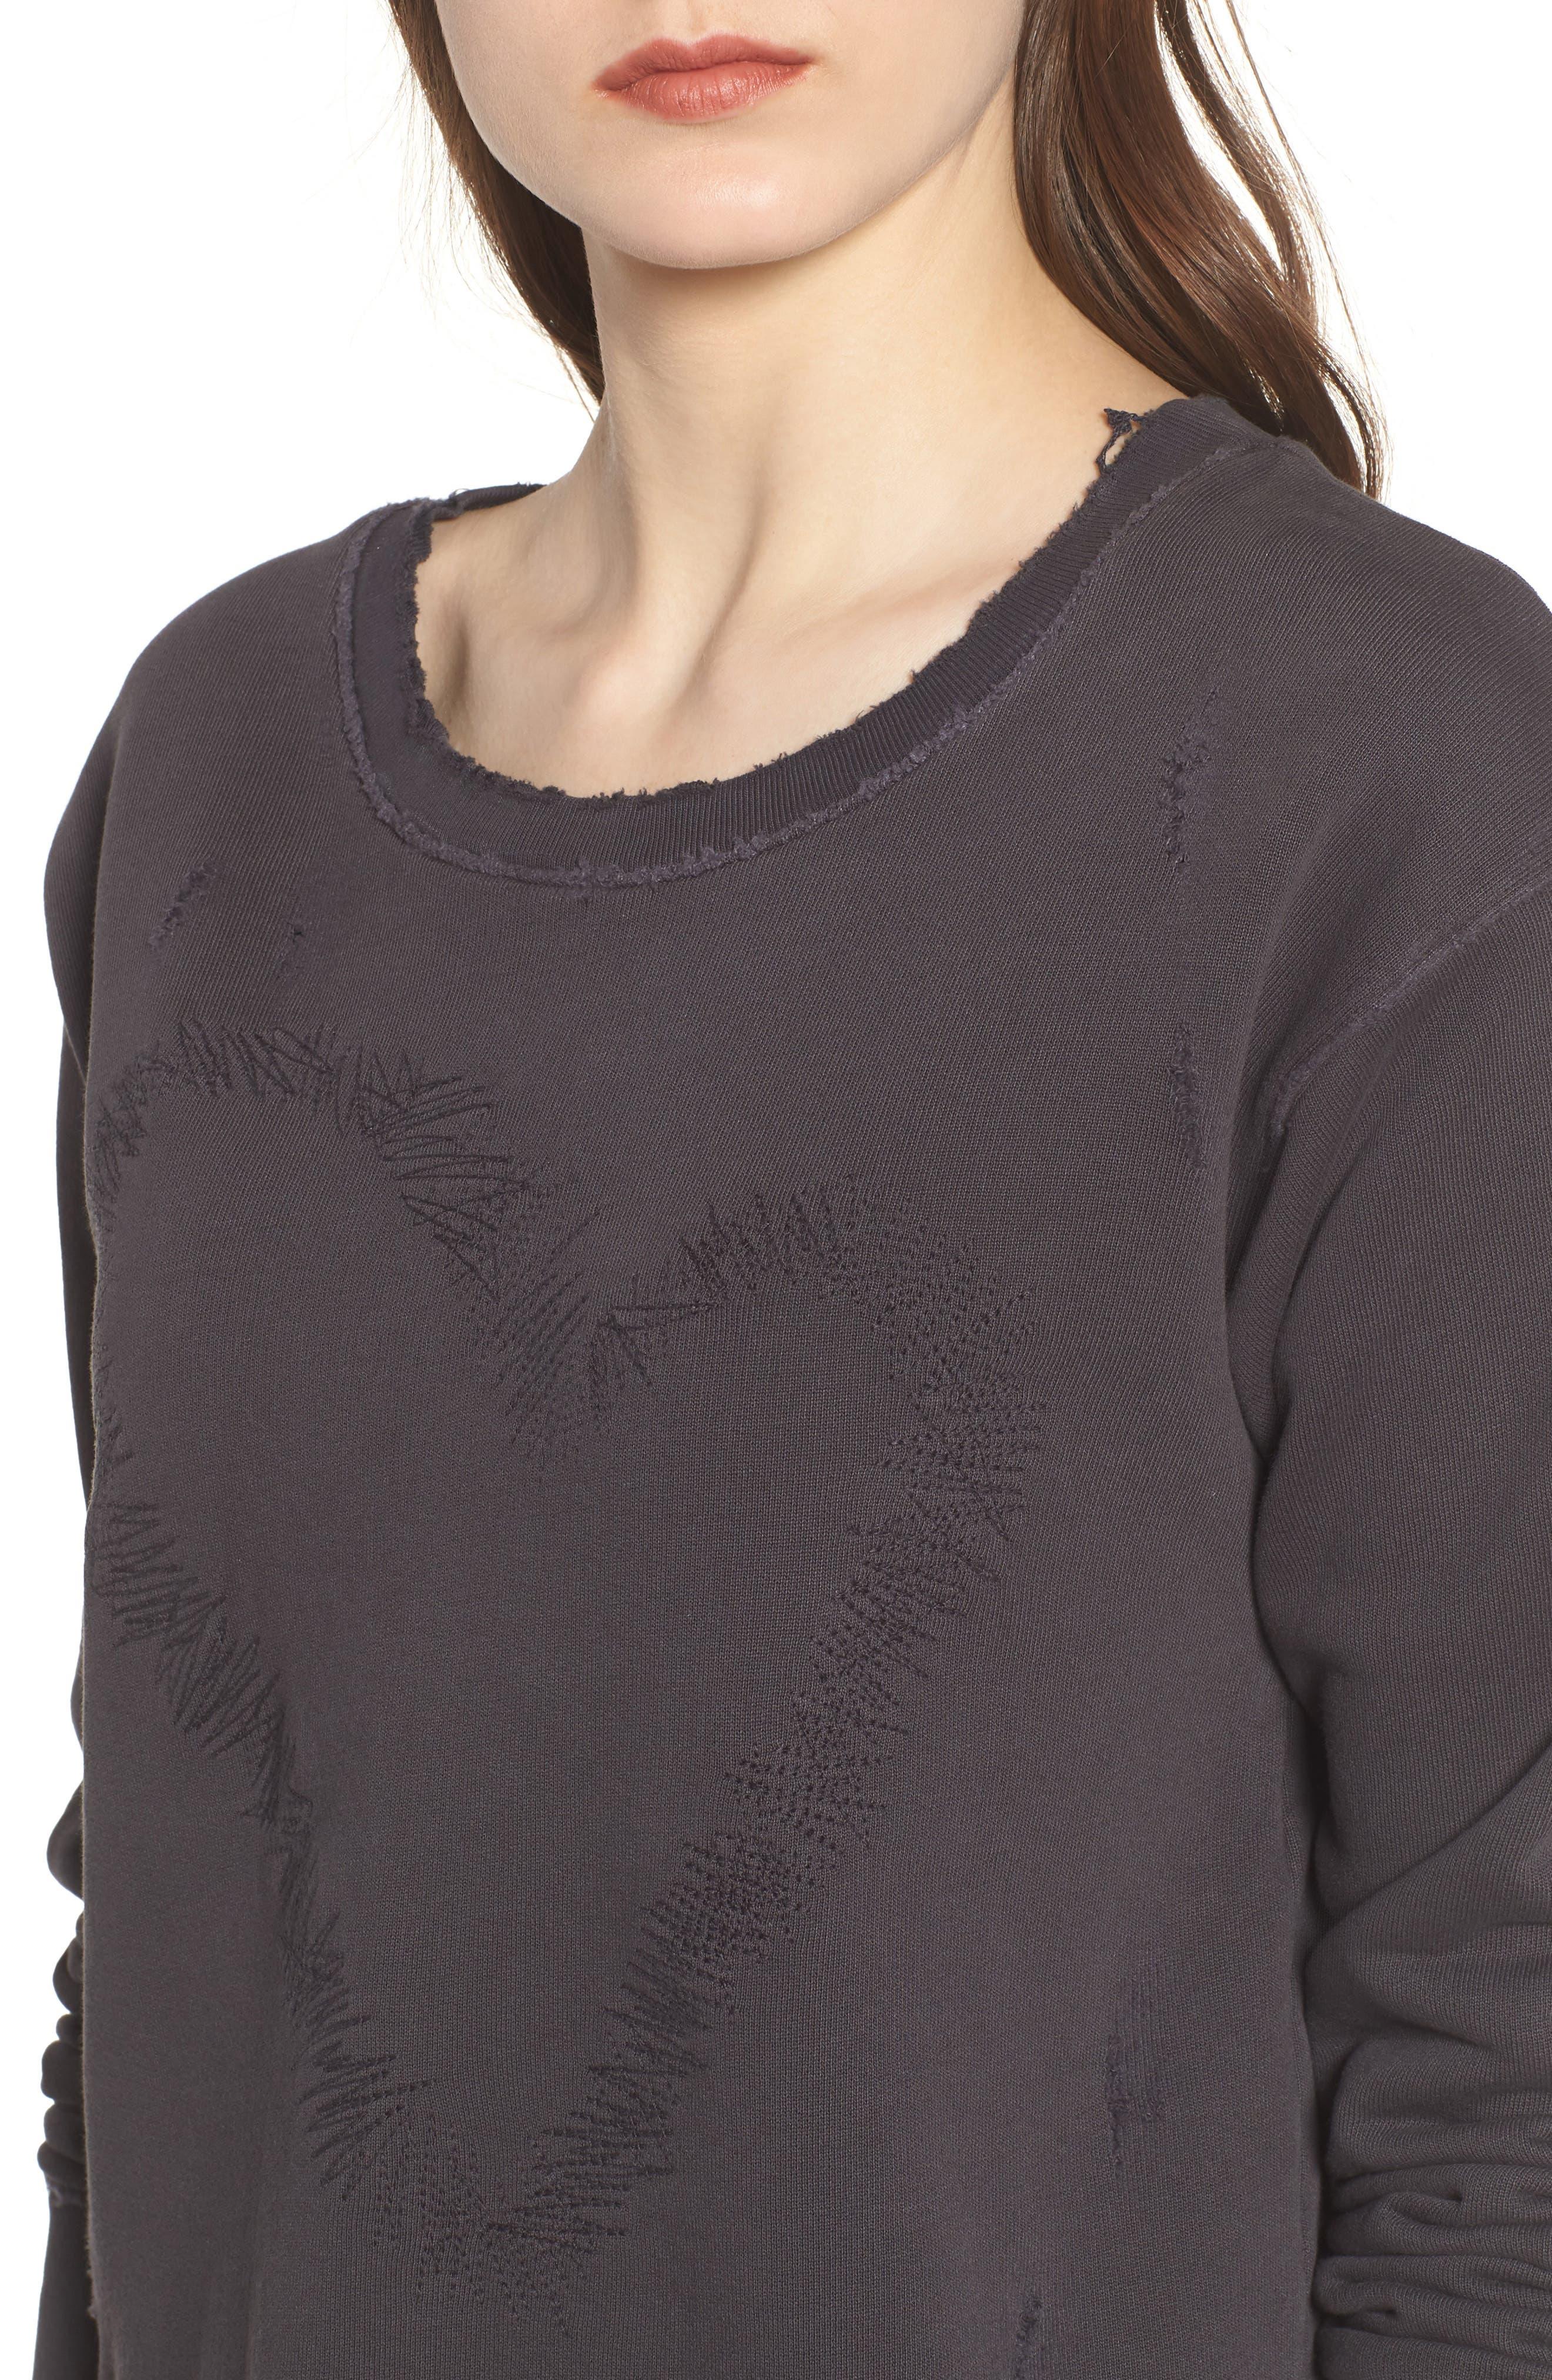 Heart Embroidered Sweatshirt,                             Alternate thumbnail 4, color,                             020